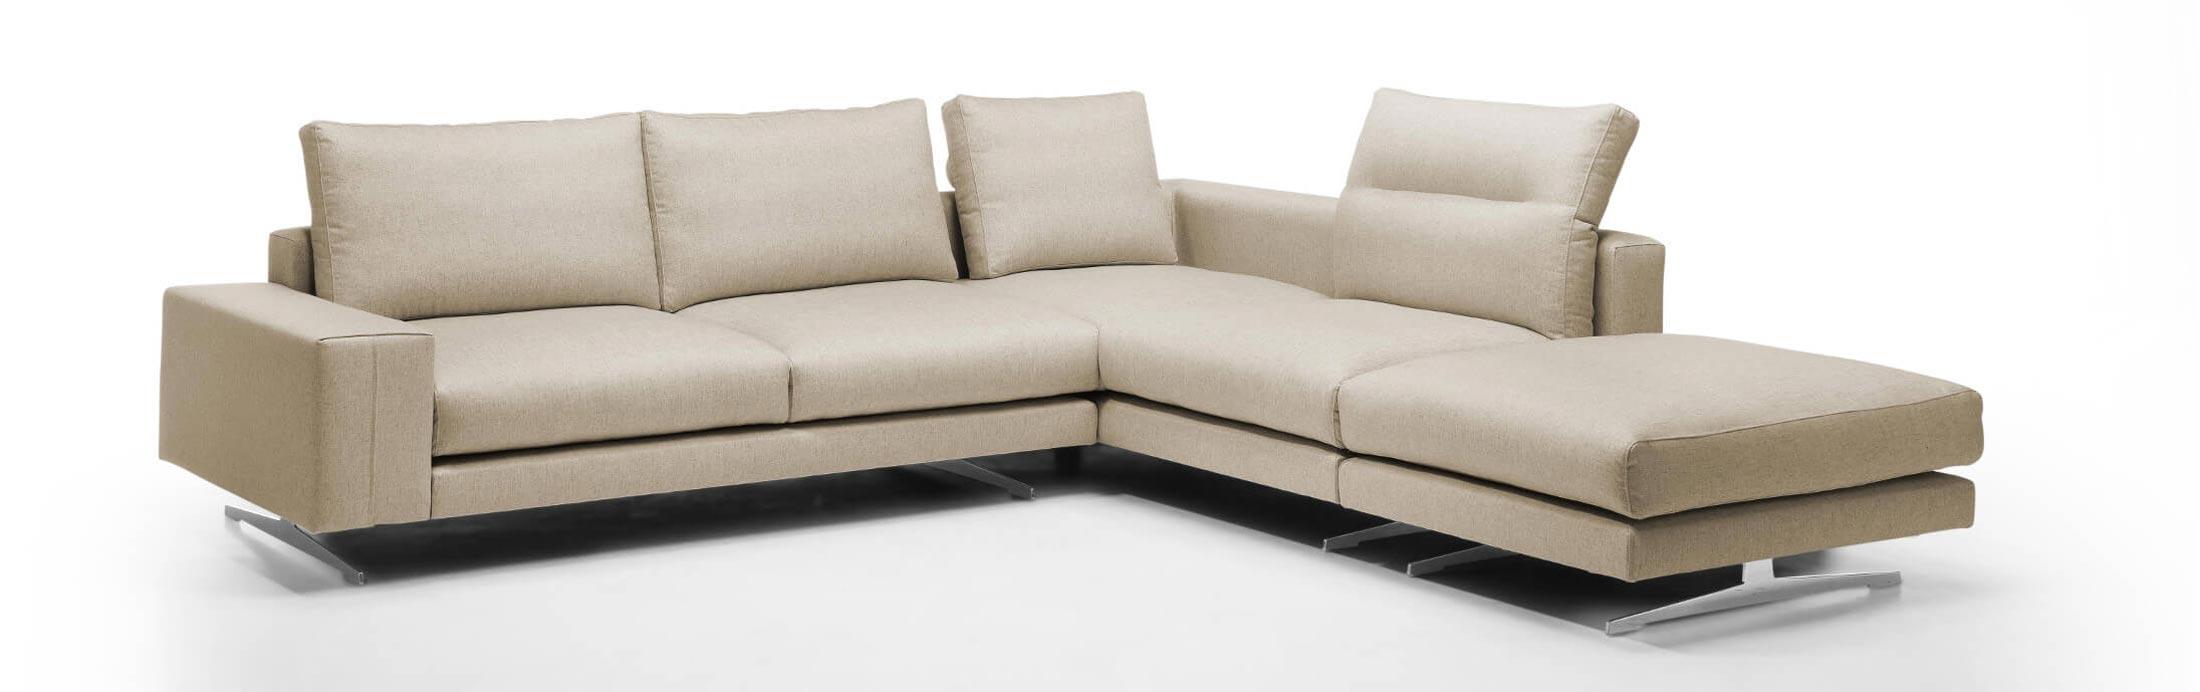 Poso Sofa